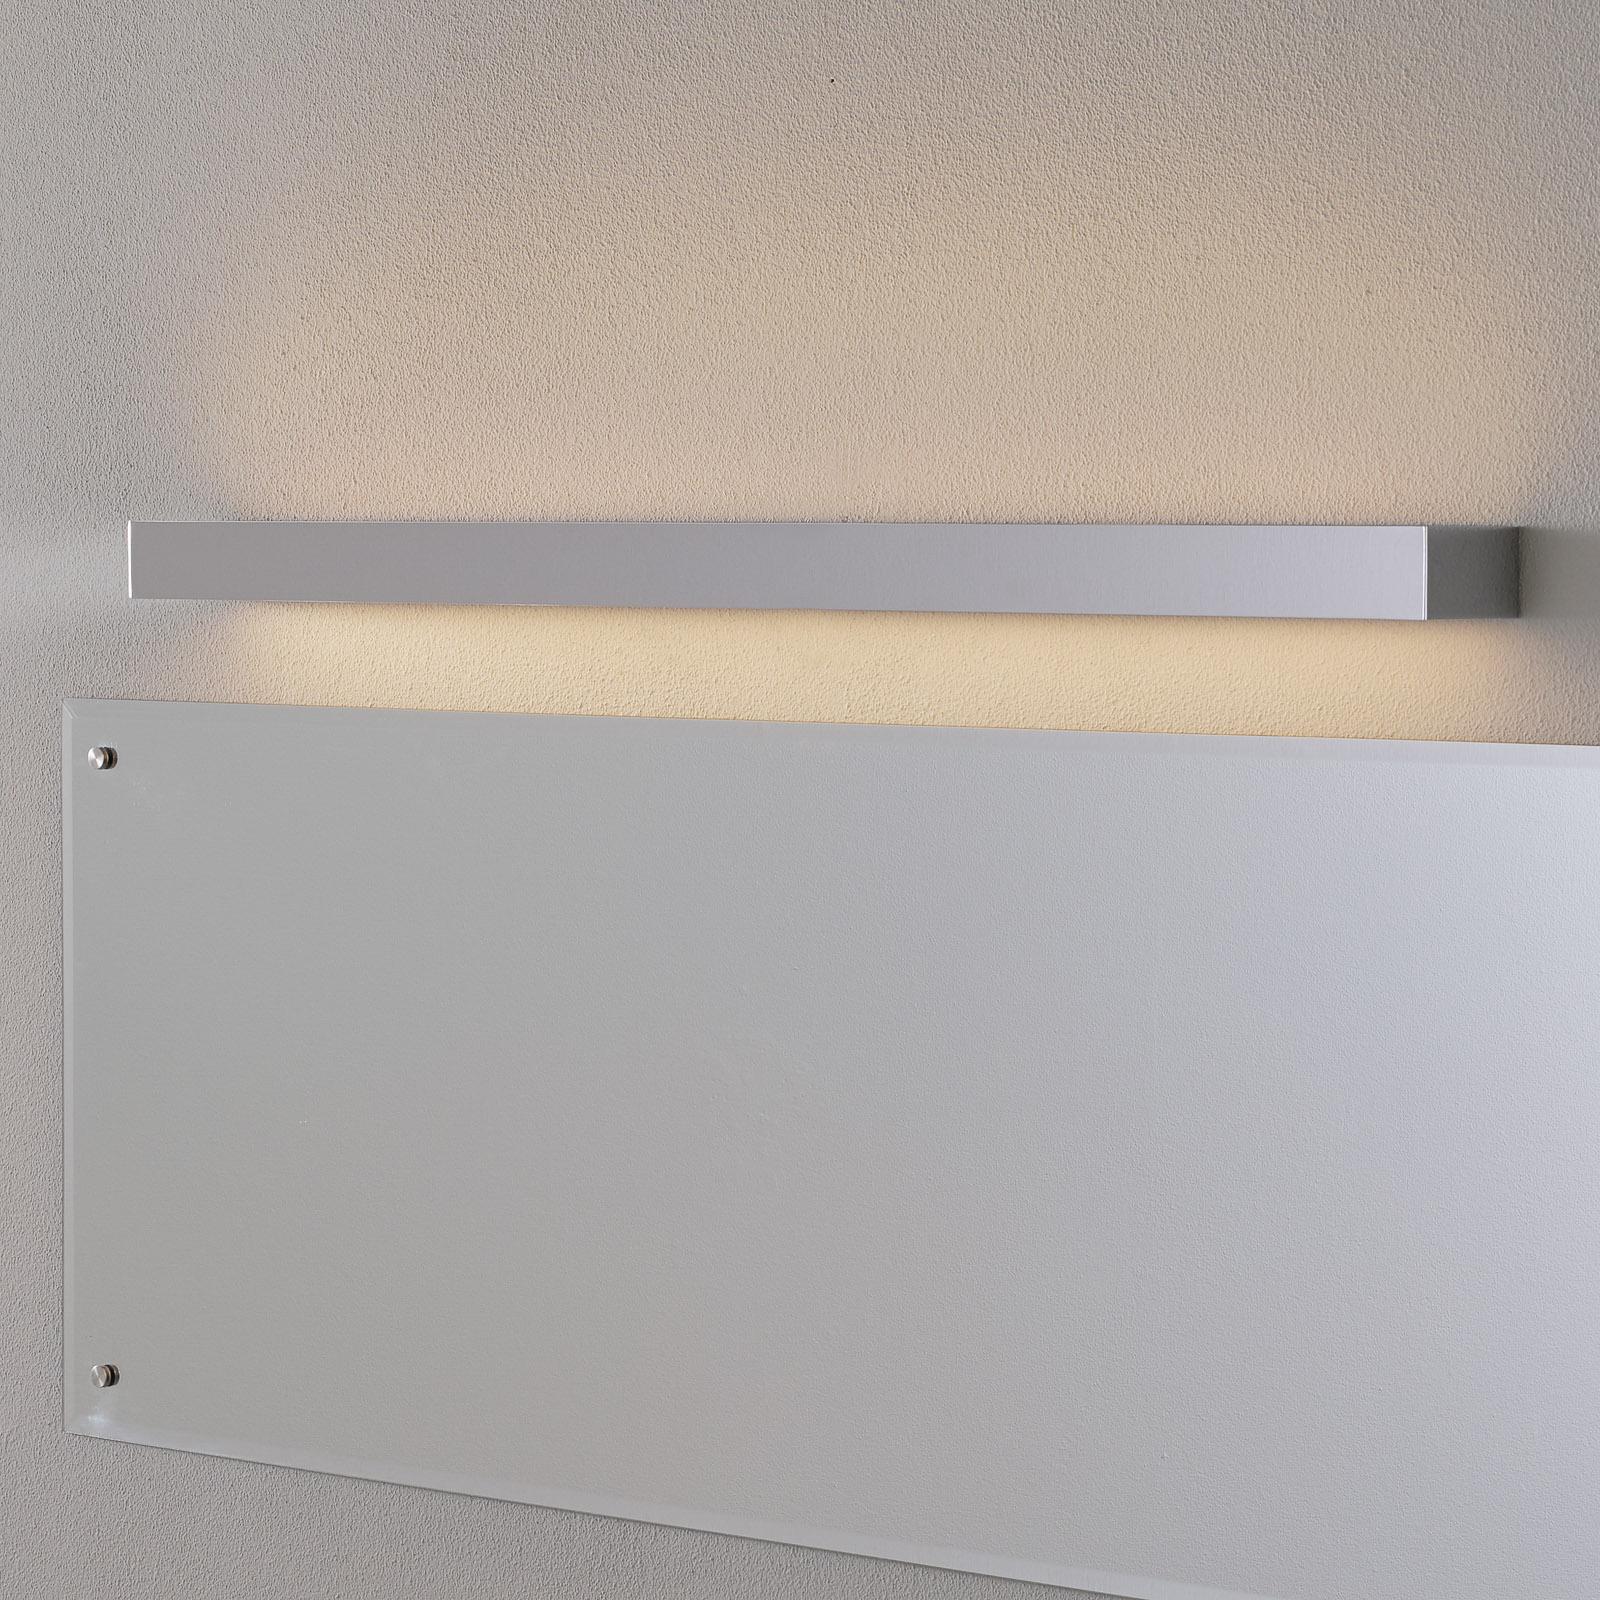 Helestra Theia luce per specchio a LED cromo, 90cm